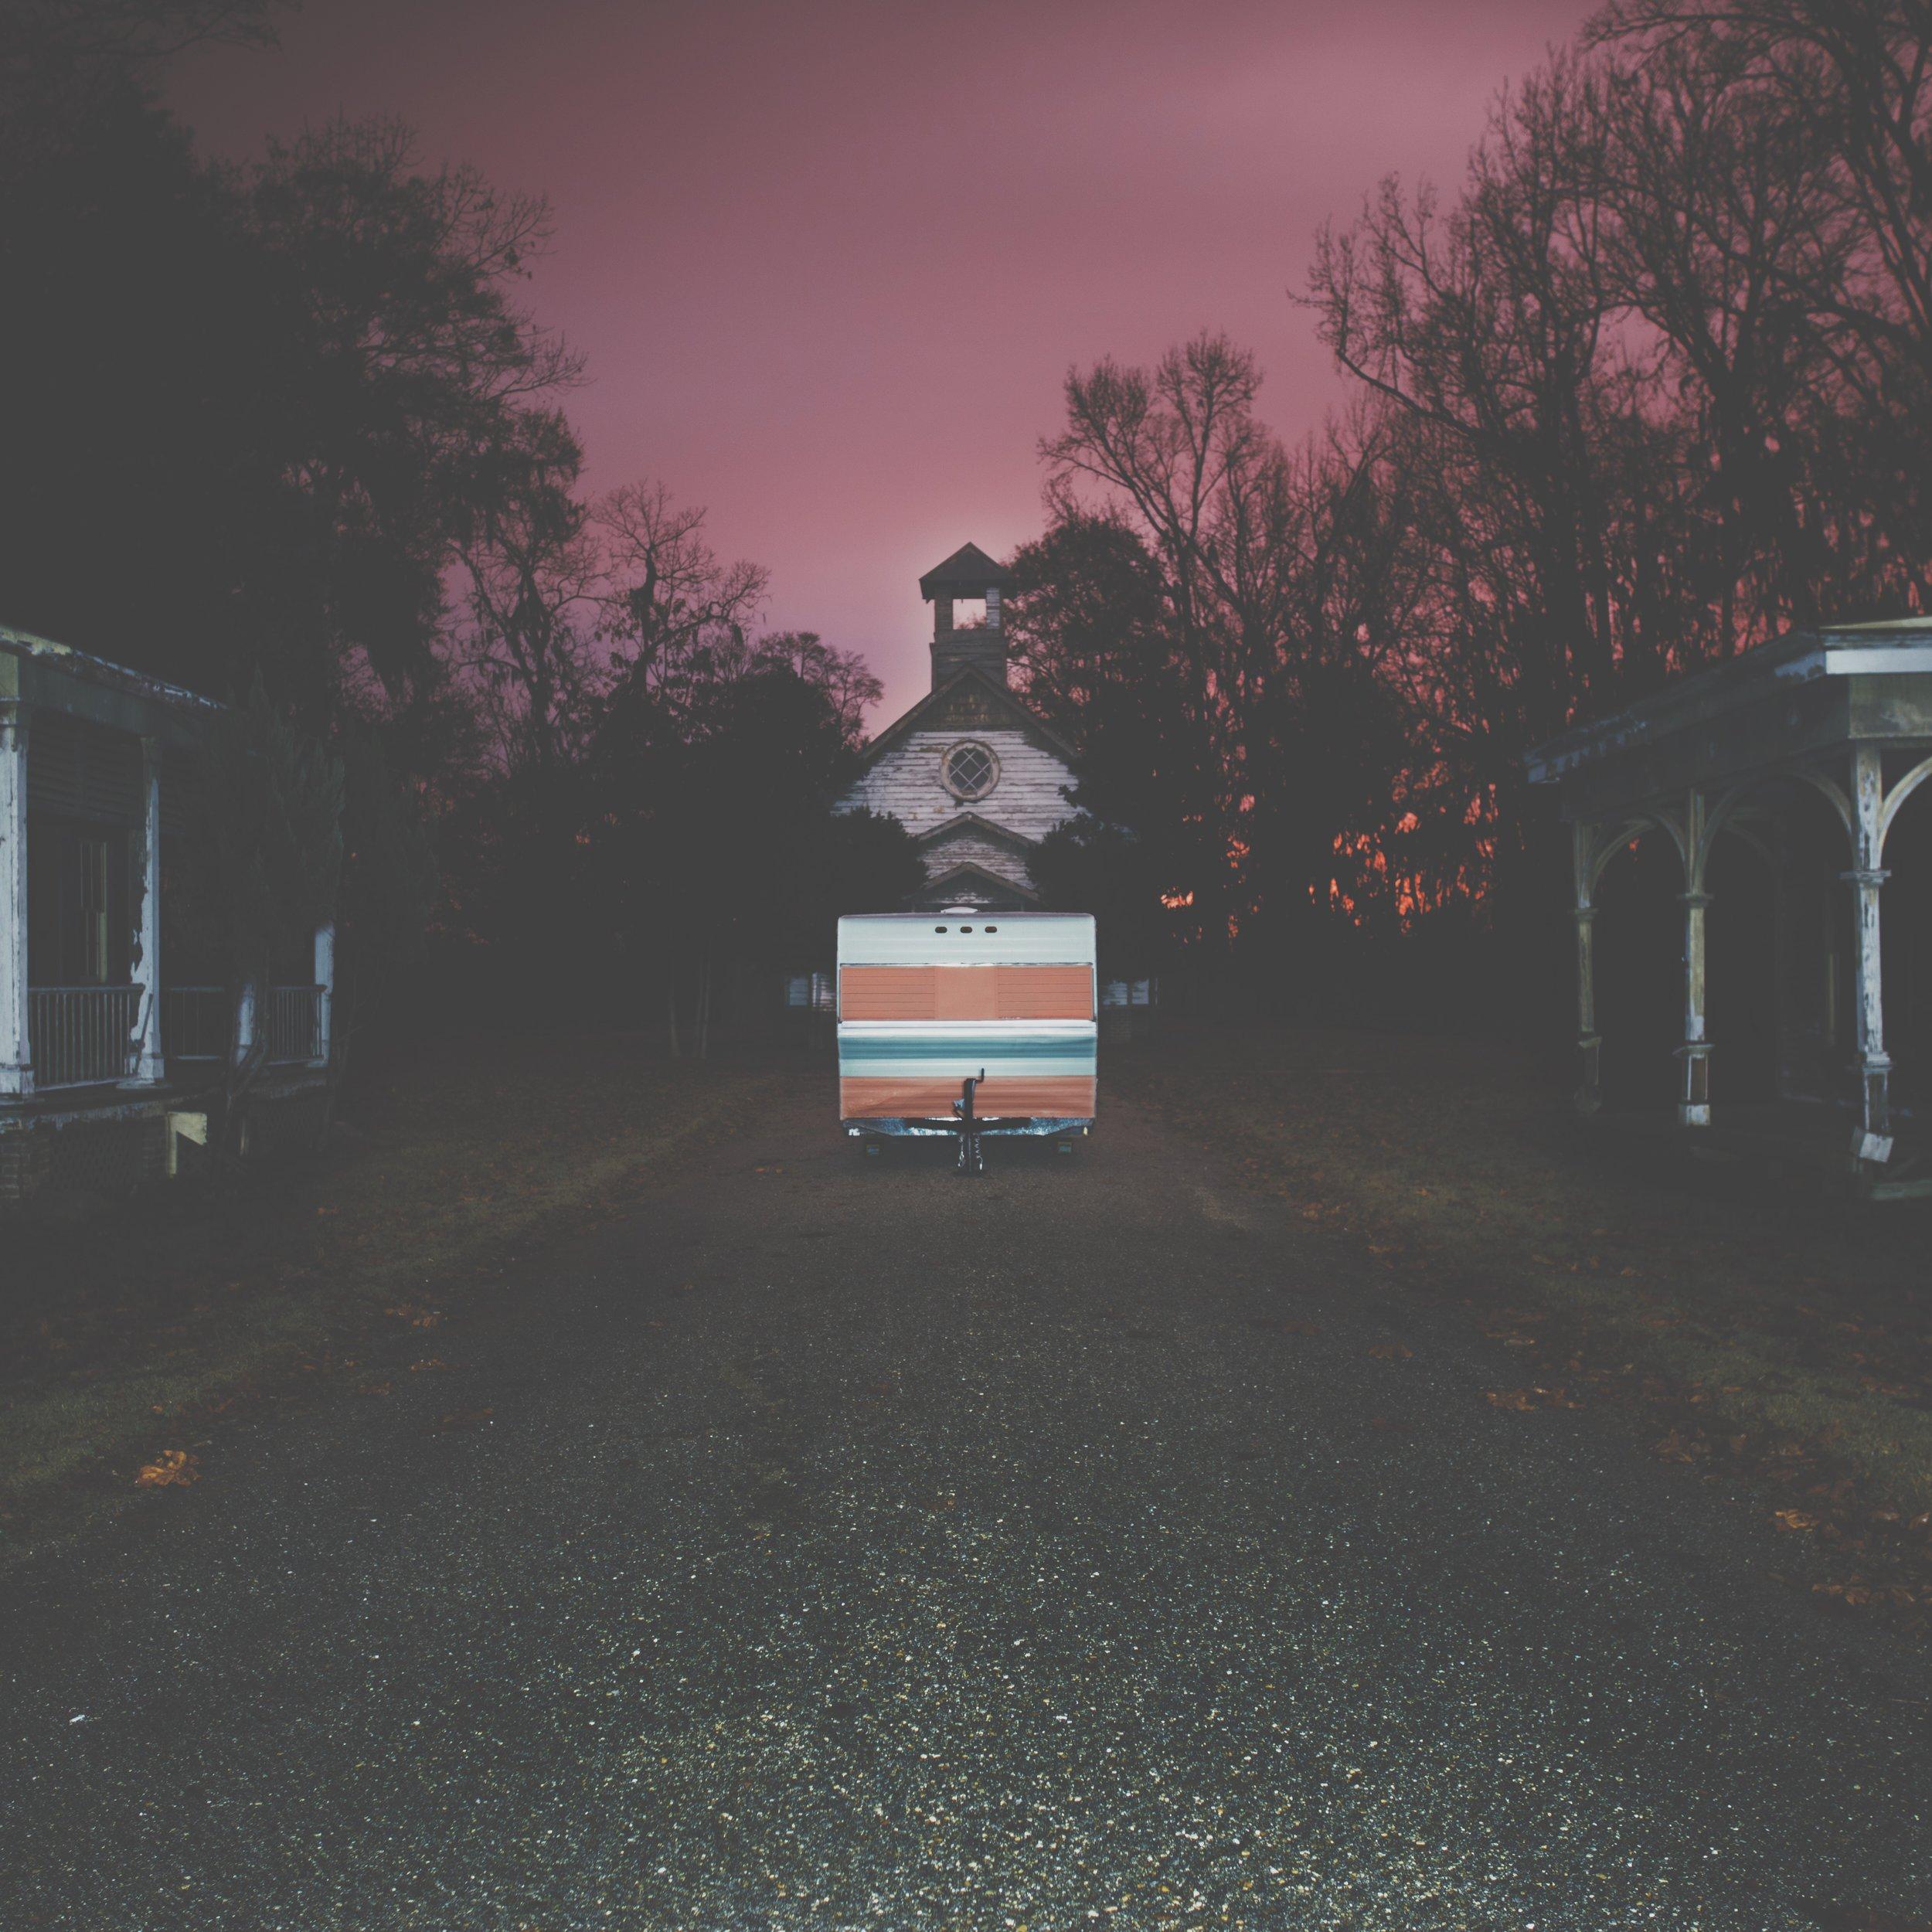 A spooky long exposure